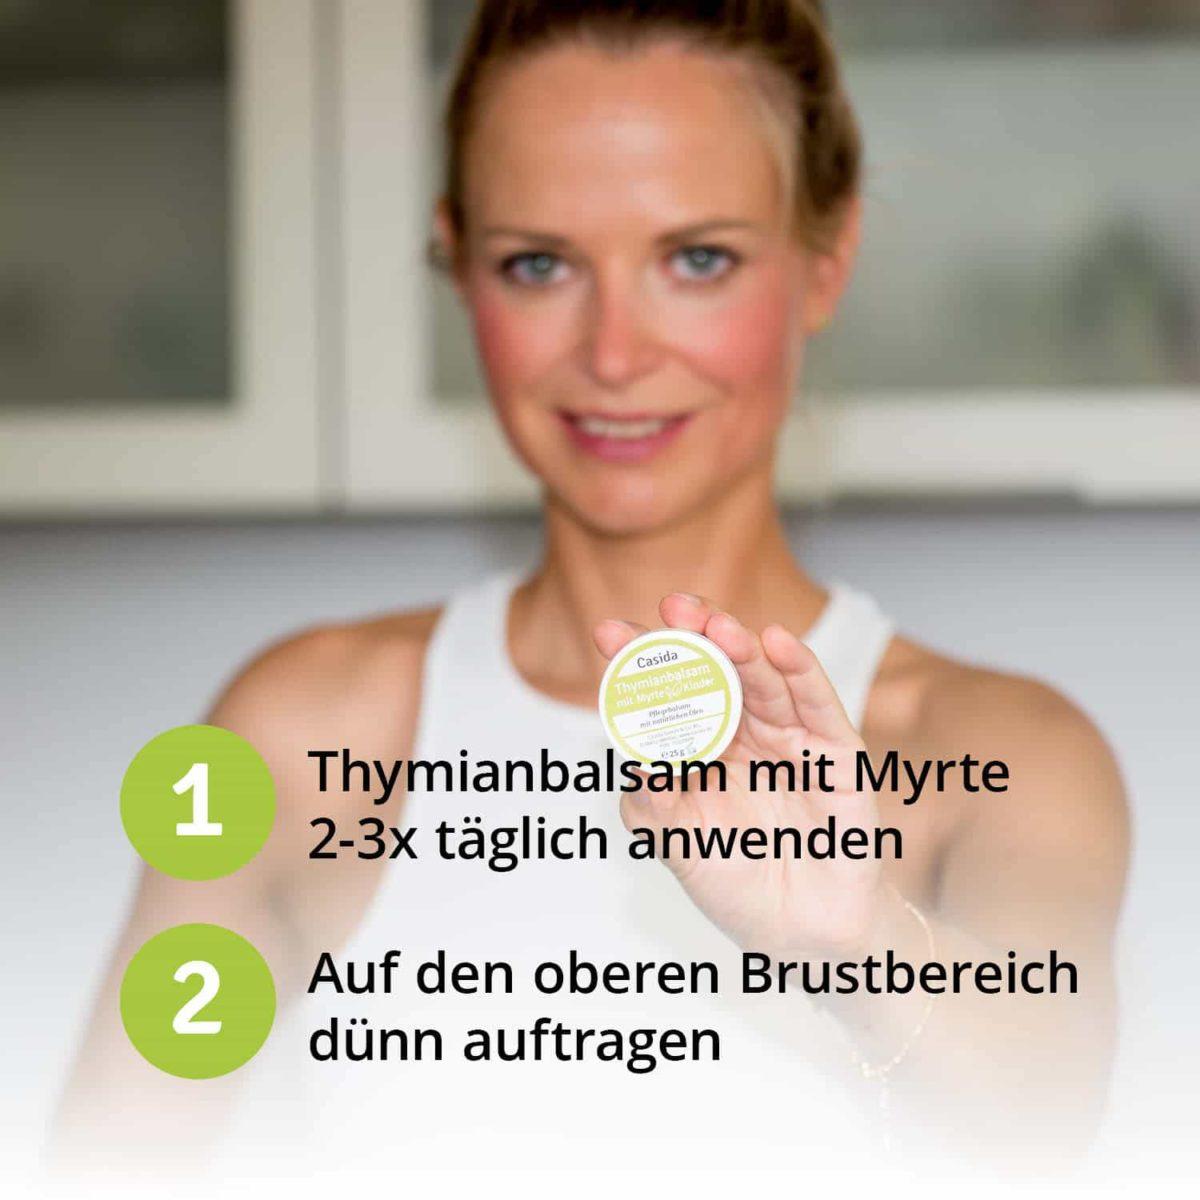 Casida Thyme Balm with Myrtle for Adults 25 g 10086706 PZN Apotheke Erkältungsbalsam husten6